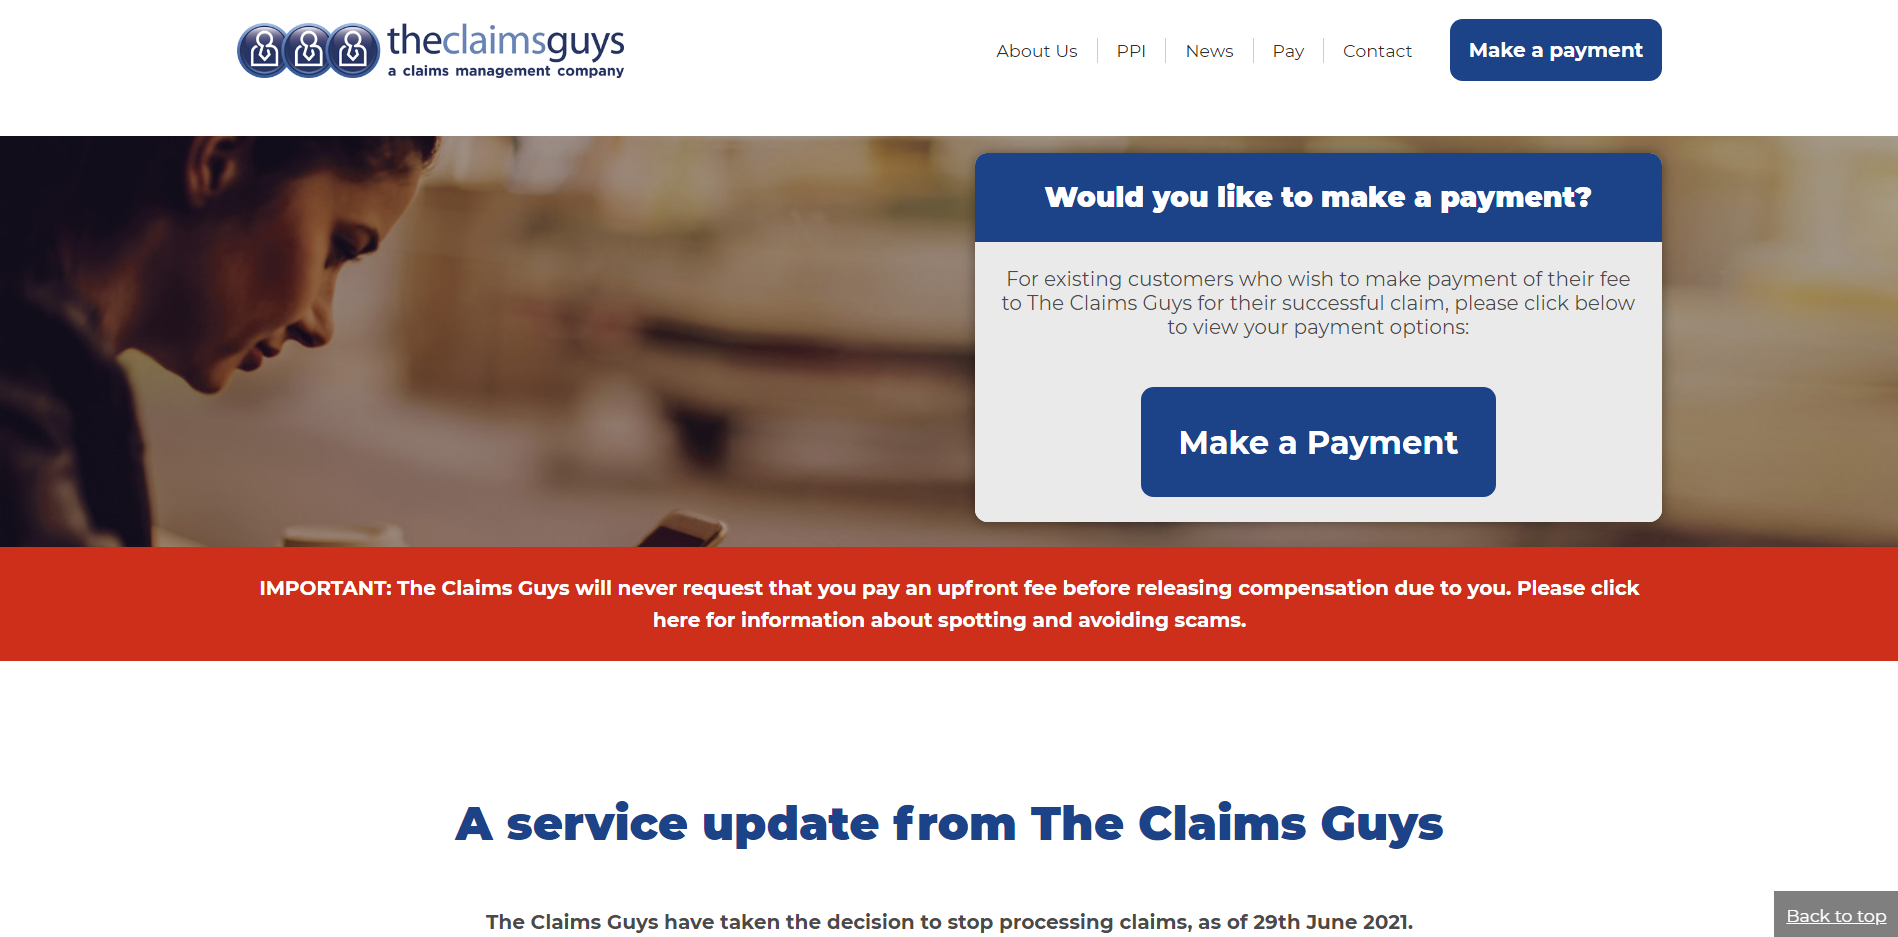 The Claim Guys